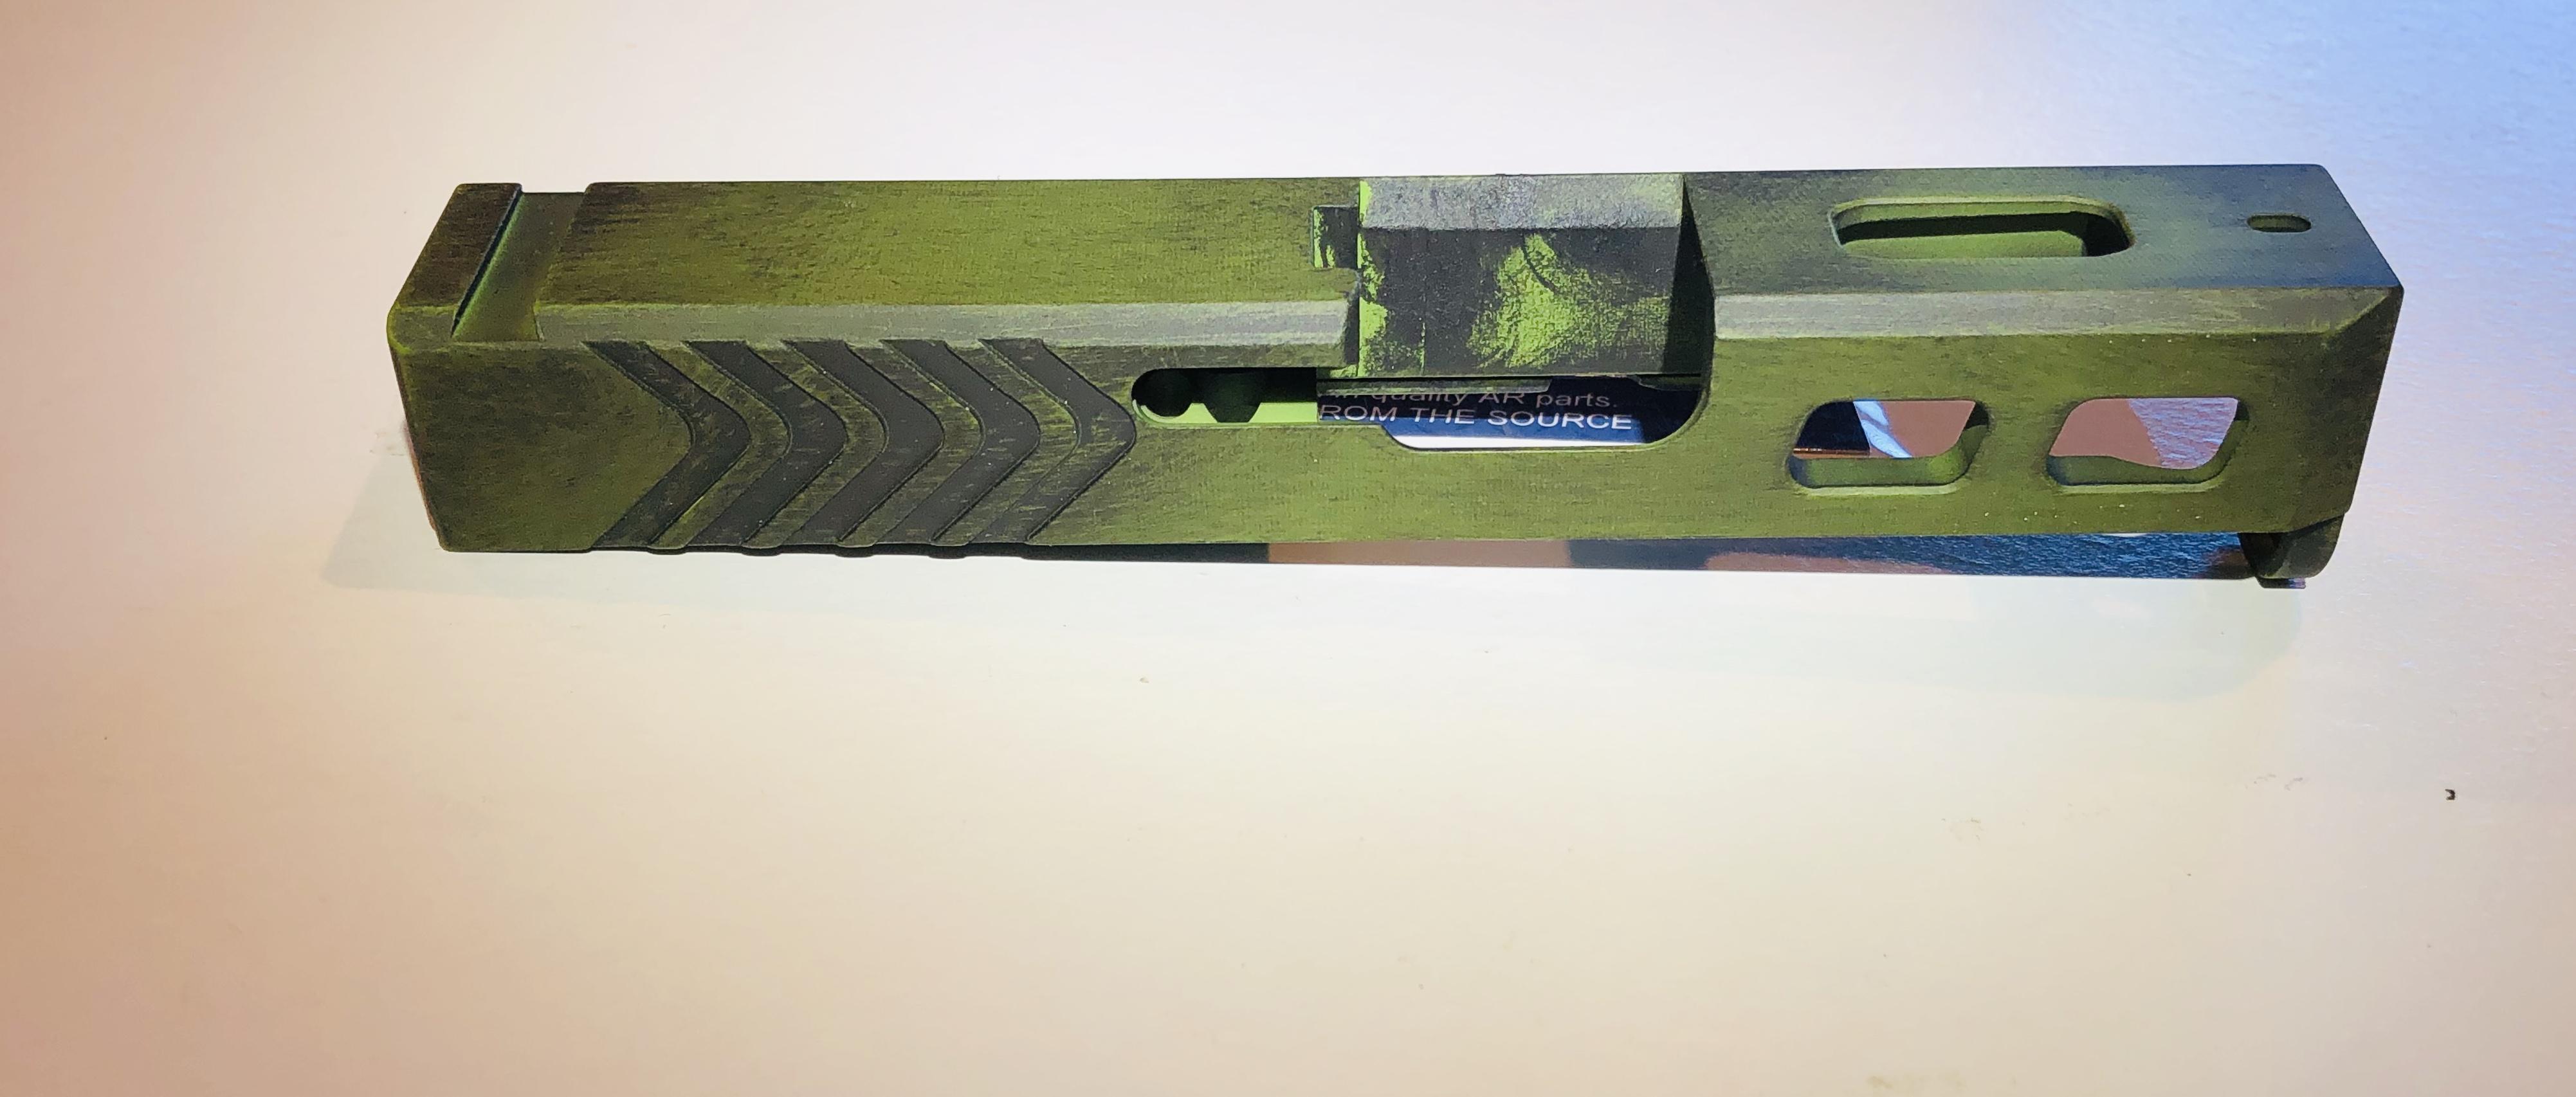 Glock 26 custom slide -Zombie green and battle worn black in color- fits  gen 1-4